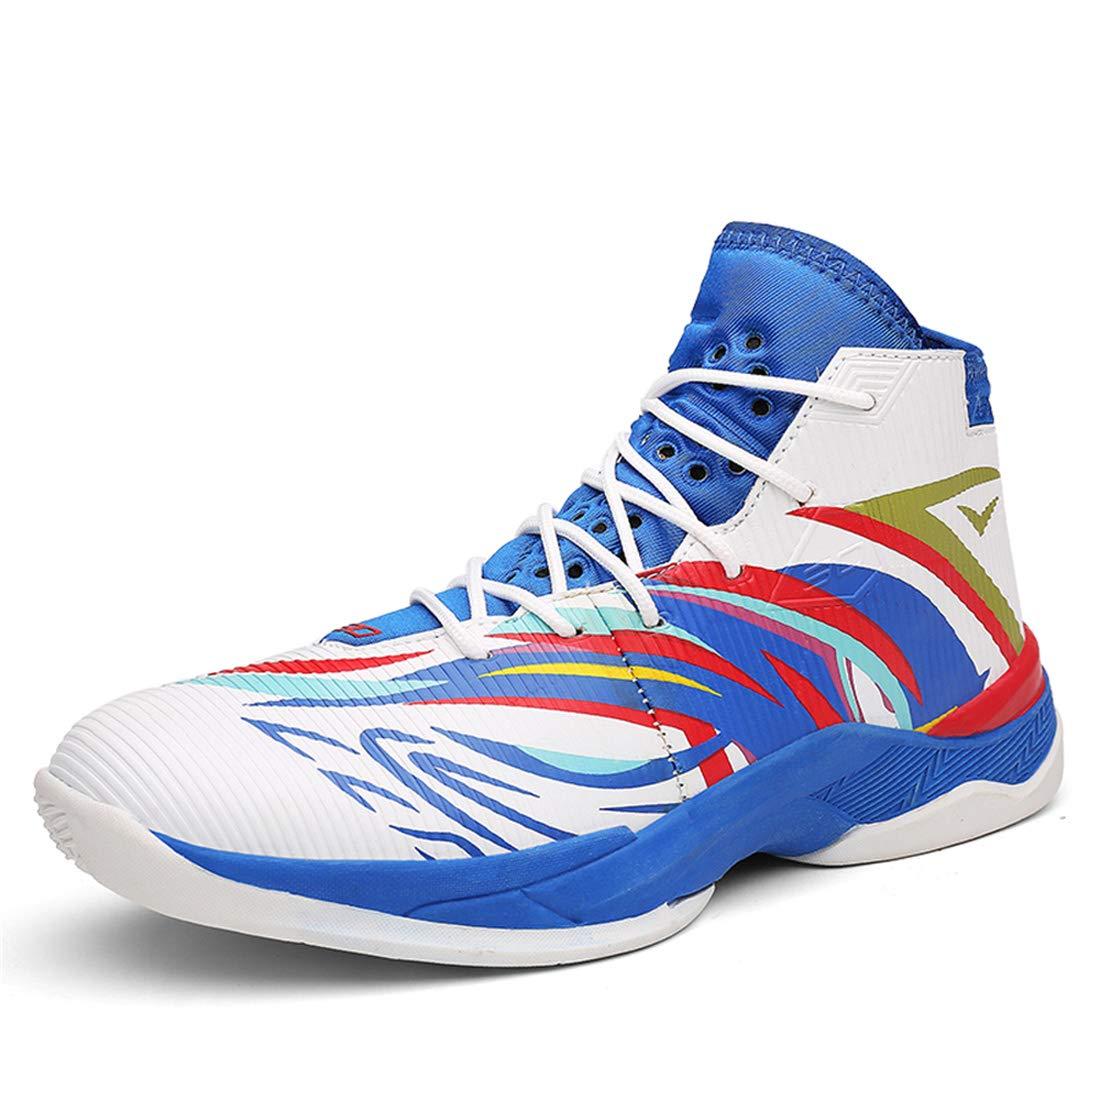 Basket Ball Chaussures Hommes Dandanjie De gv6mYb7yIf